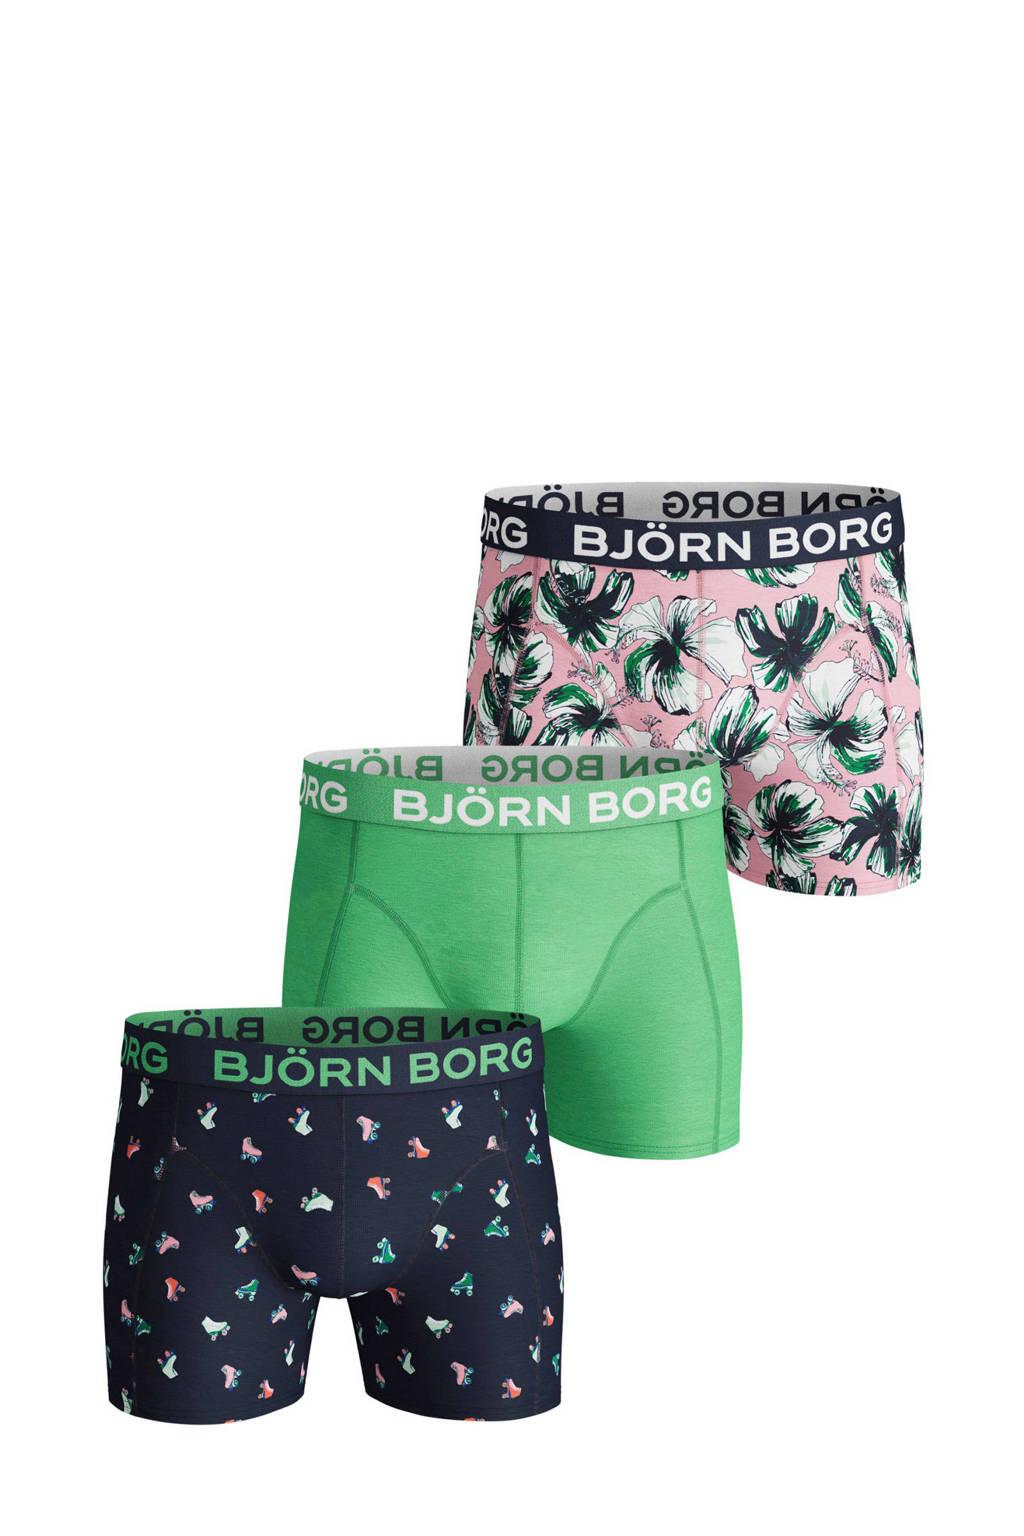 Björn Borg boxershort (set van 3), Groen/marine/roze